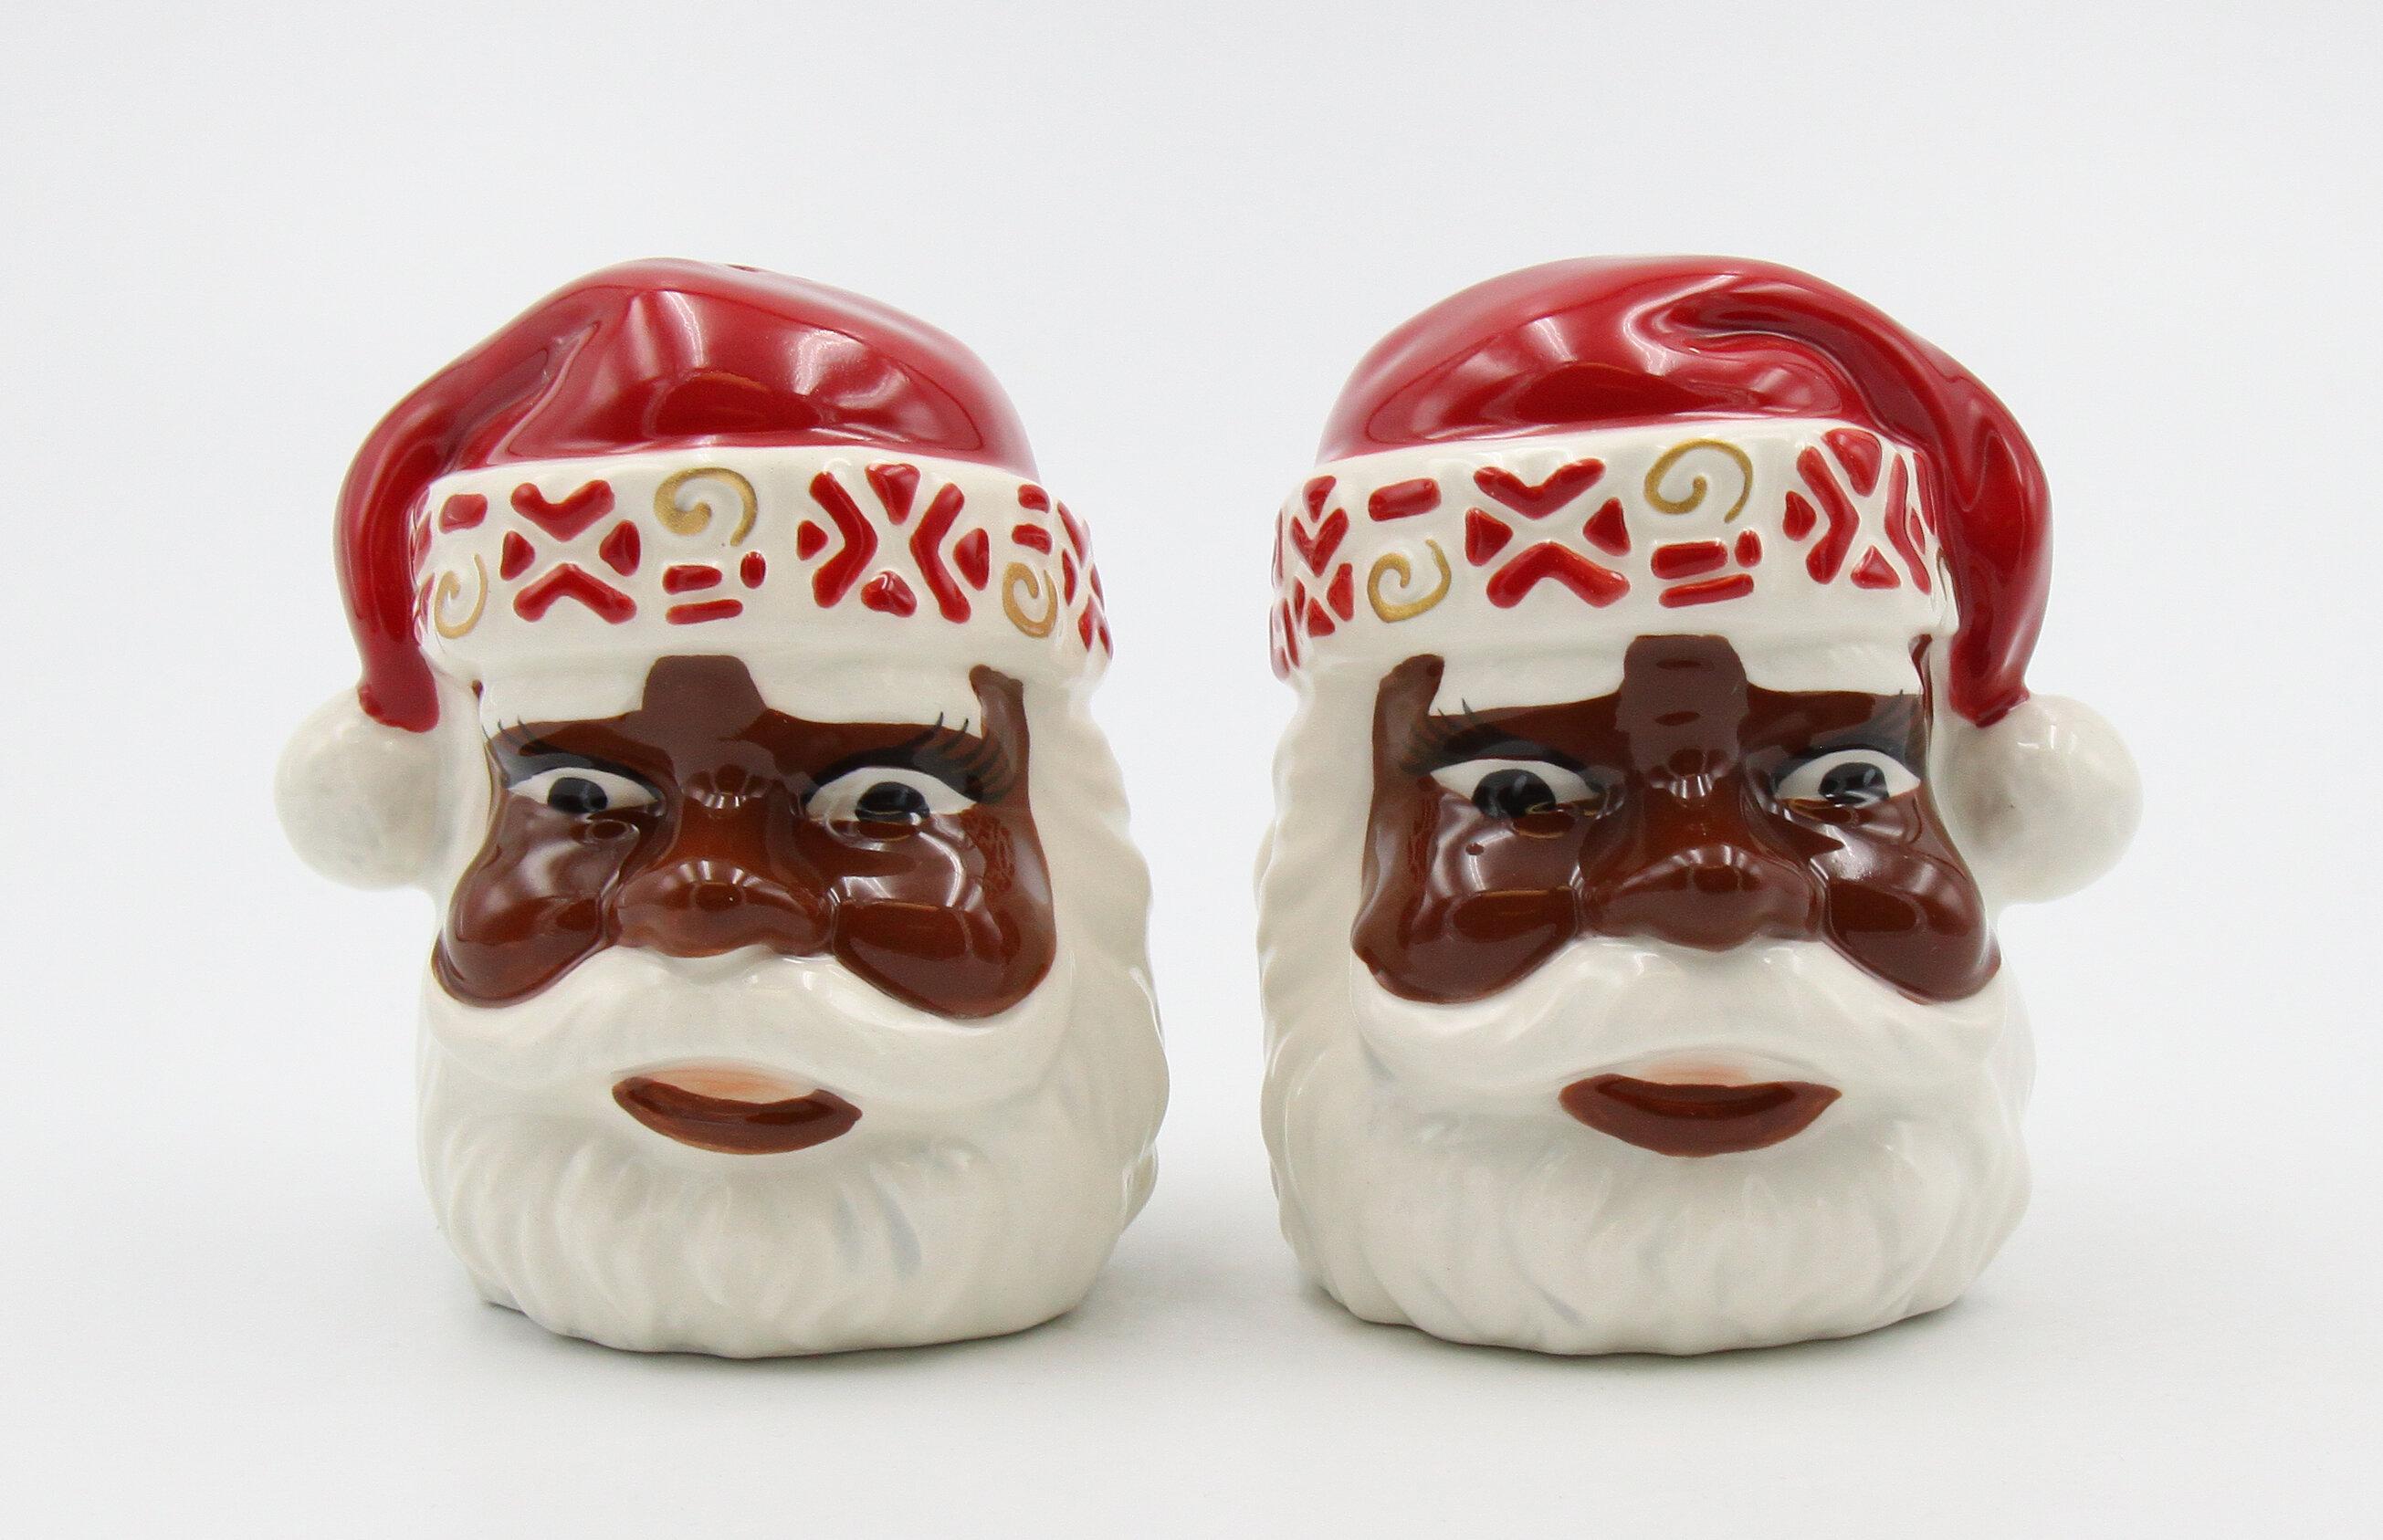 Cosmosgifts Cosmos Gifts First Light African American Santa Salt And Pepper Shaker Set Reviews Wayfair